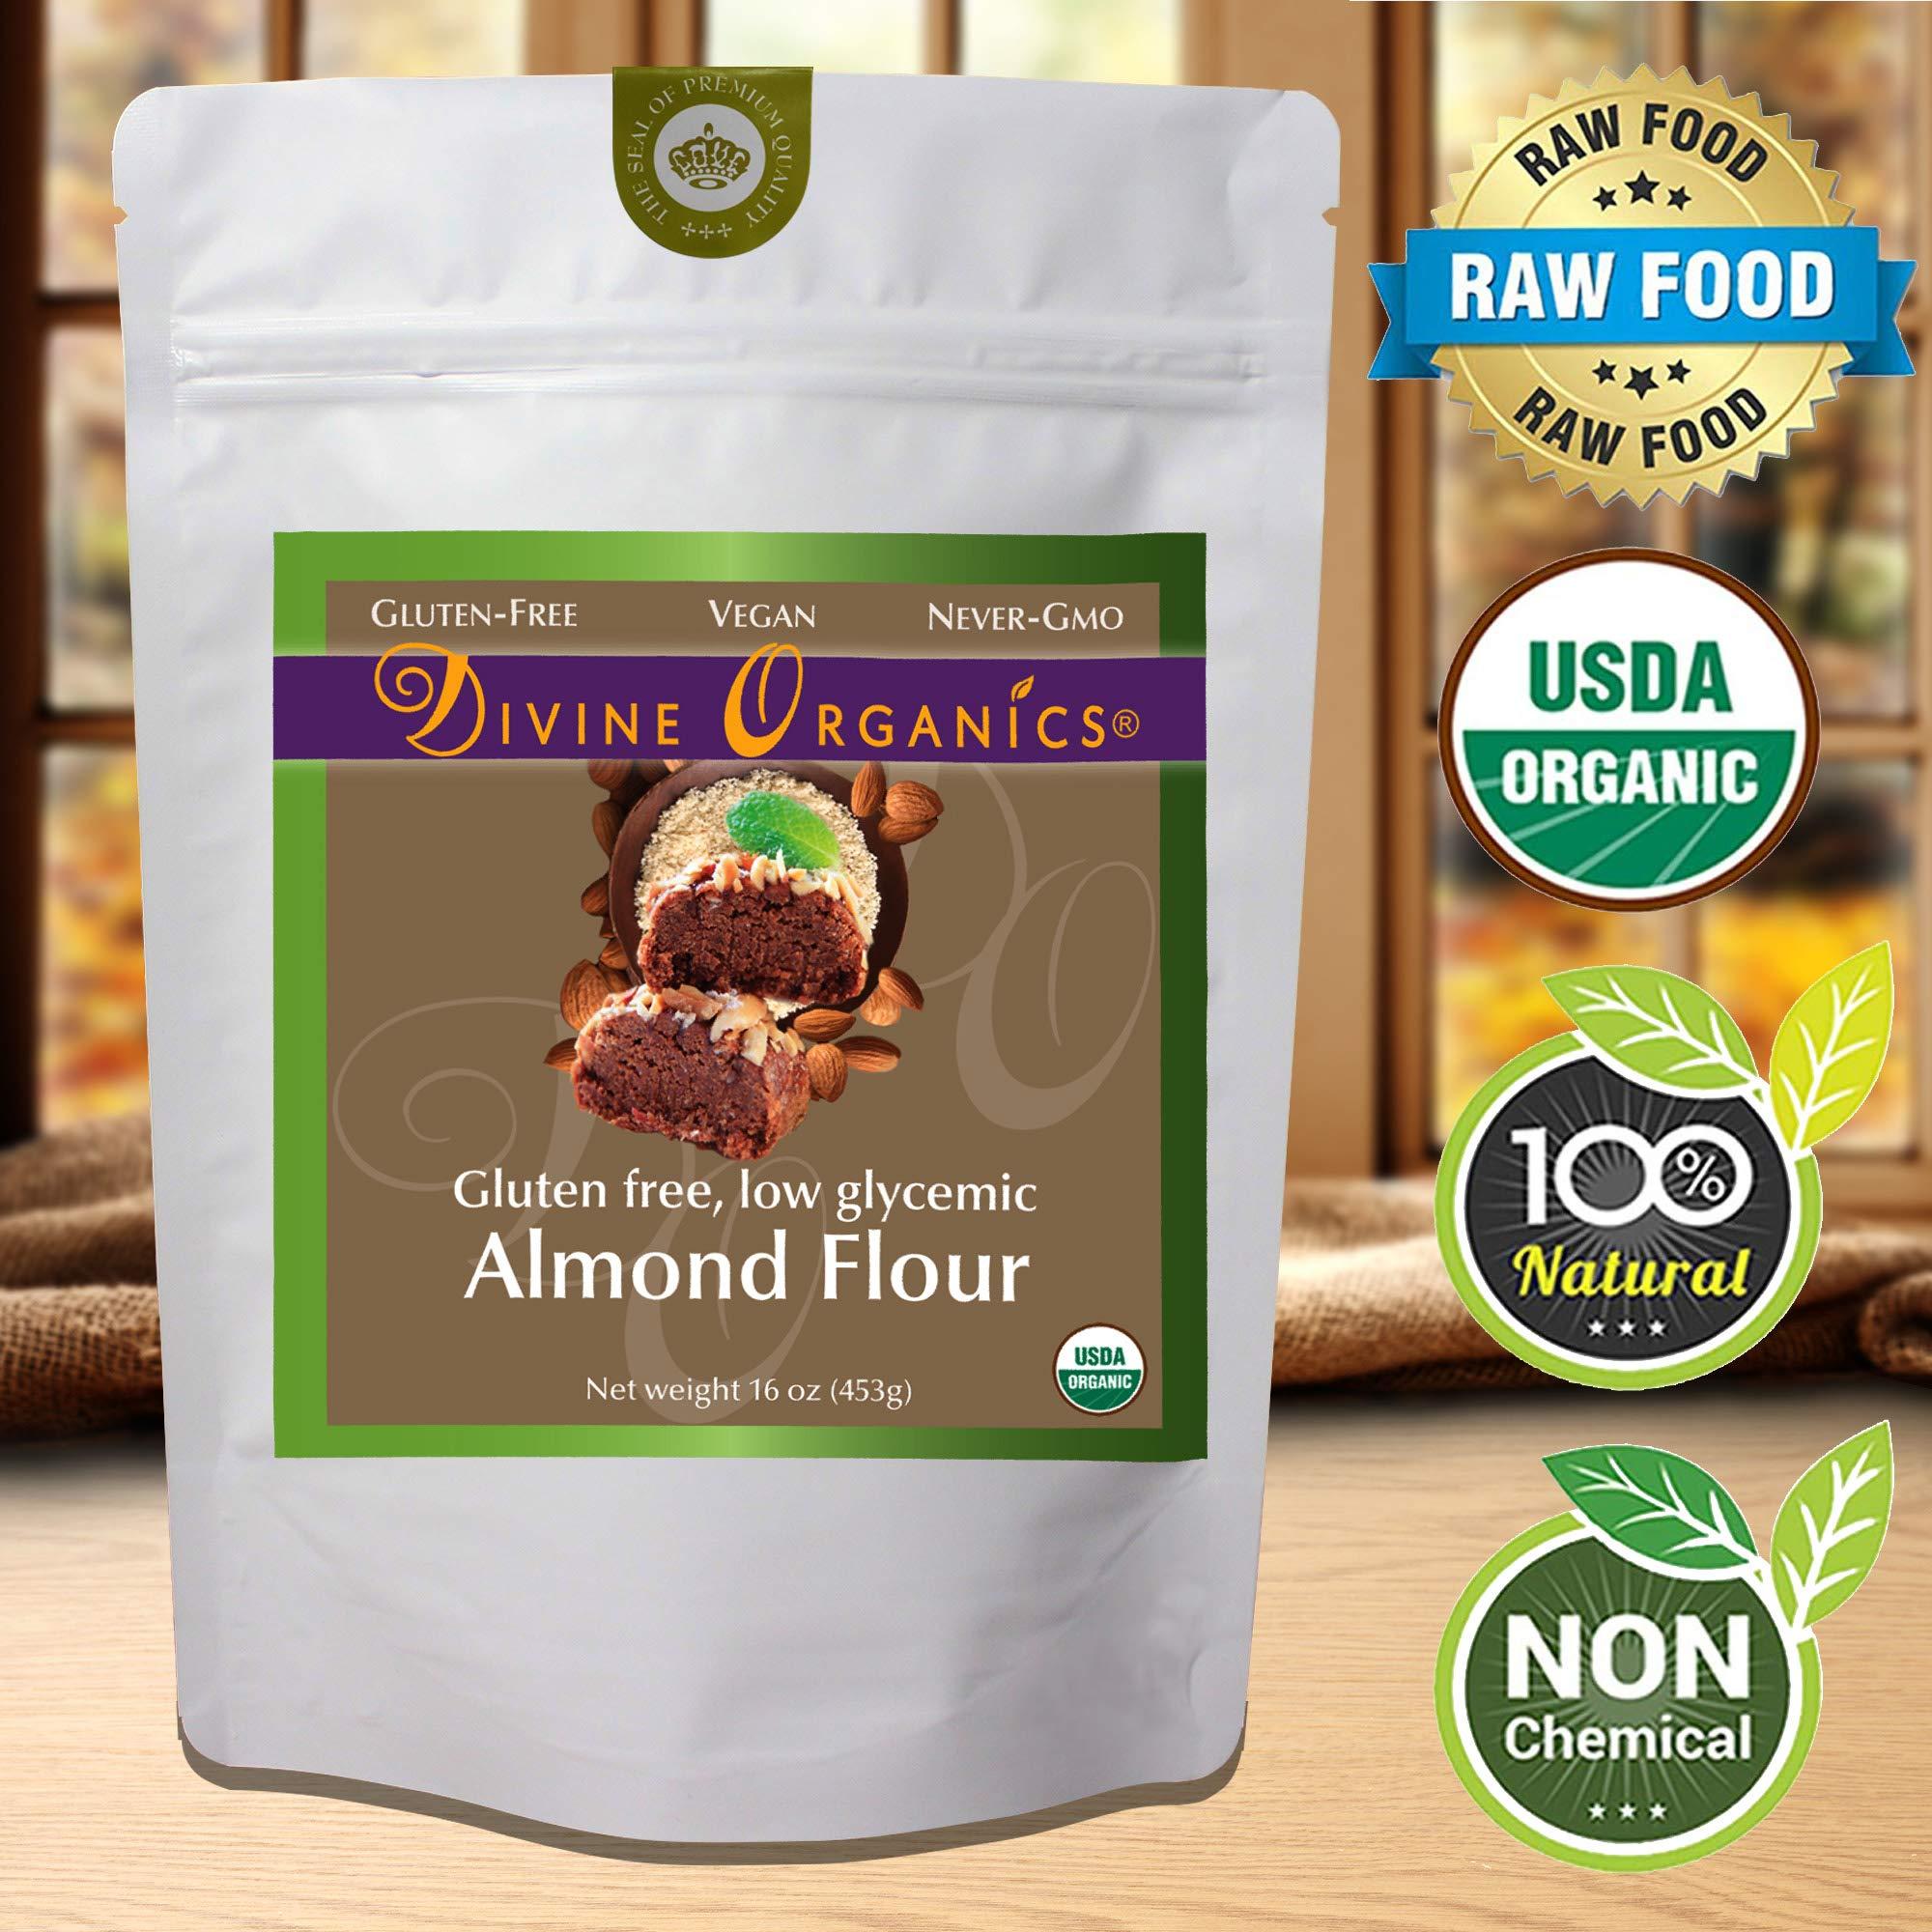 16 oz Organic Almond Flour Powdered Gluten Free Low Glycemic Non-GMO by Divine Organics